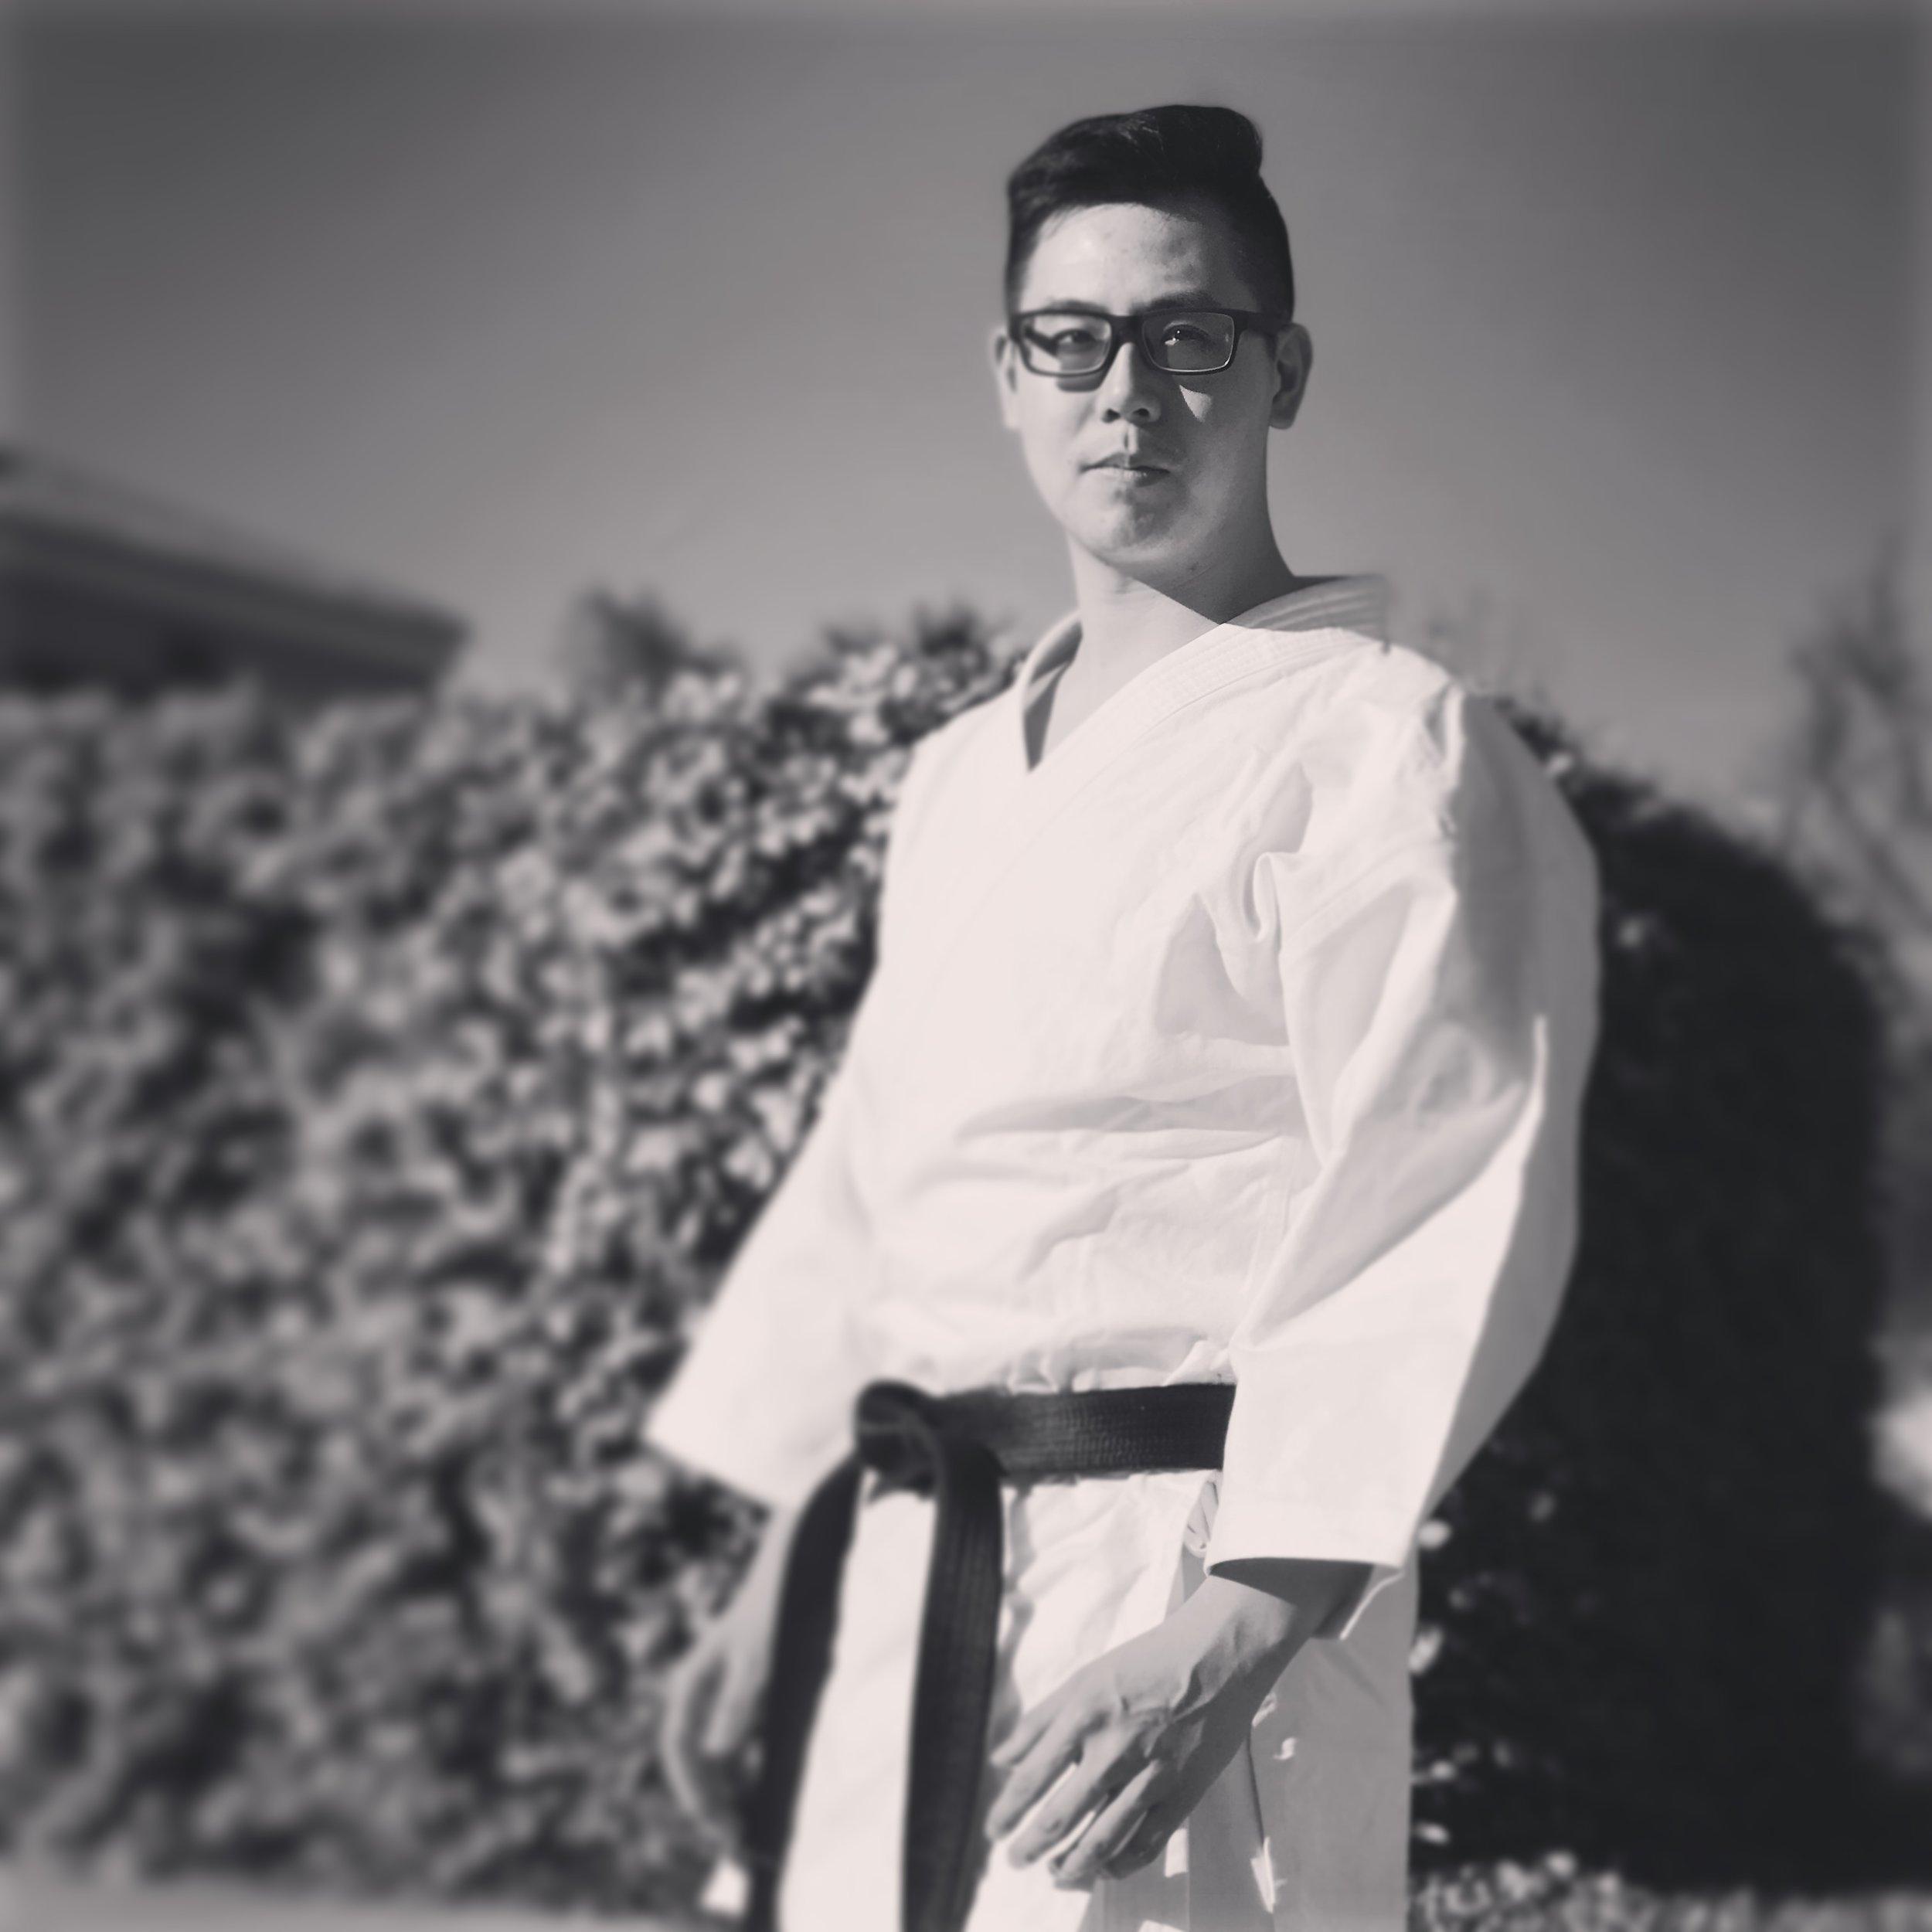 sensei_sanfrancisco_ishinryu_karate_dojo.JPG